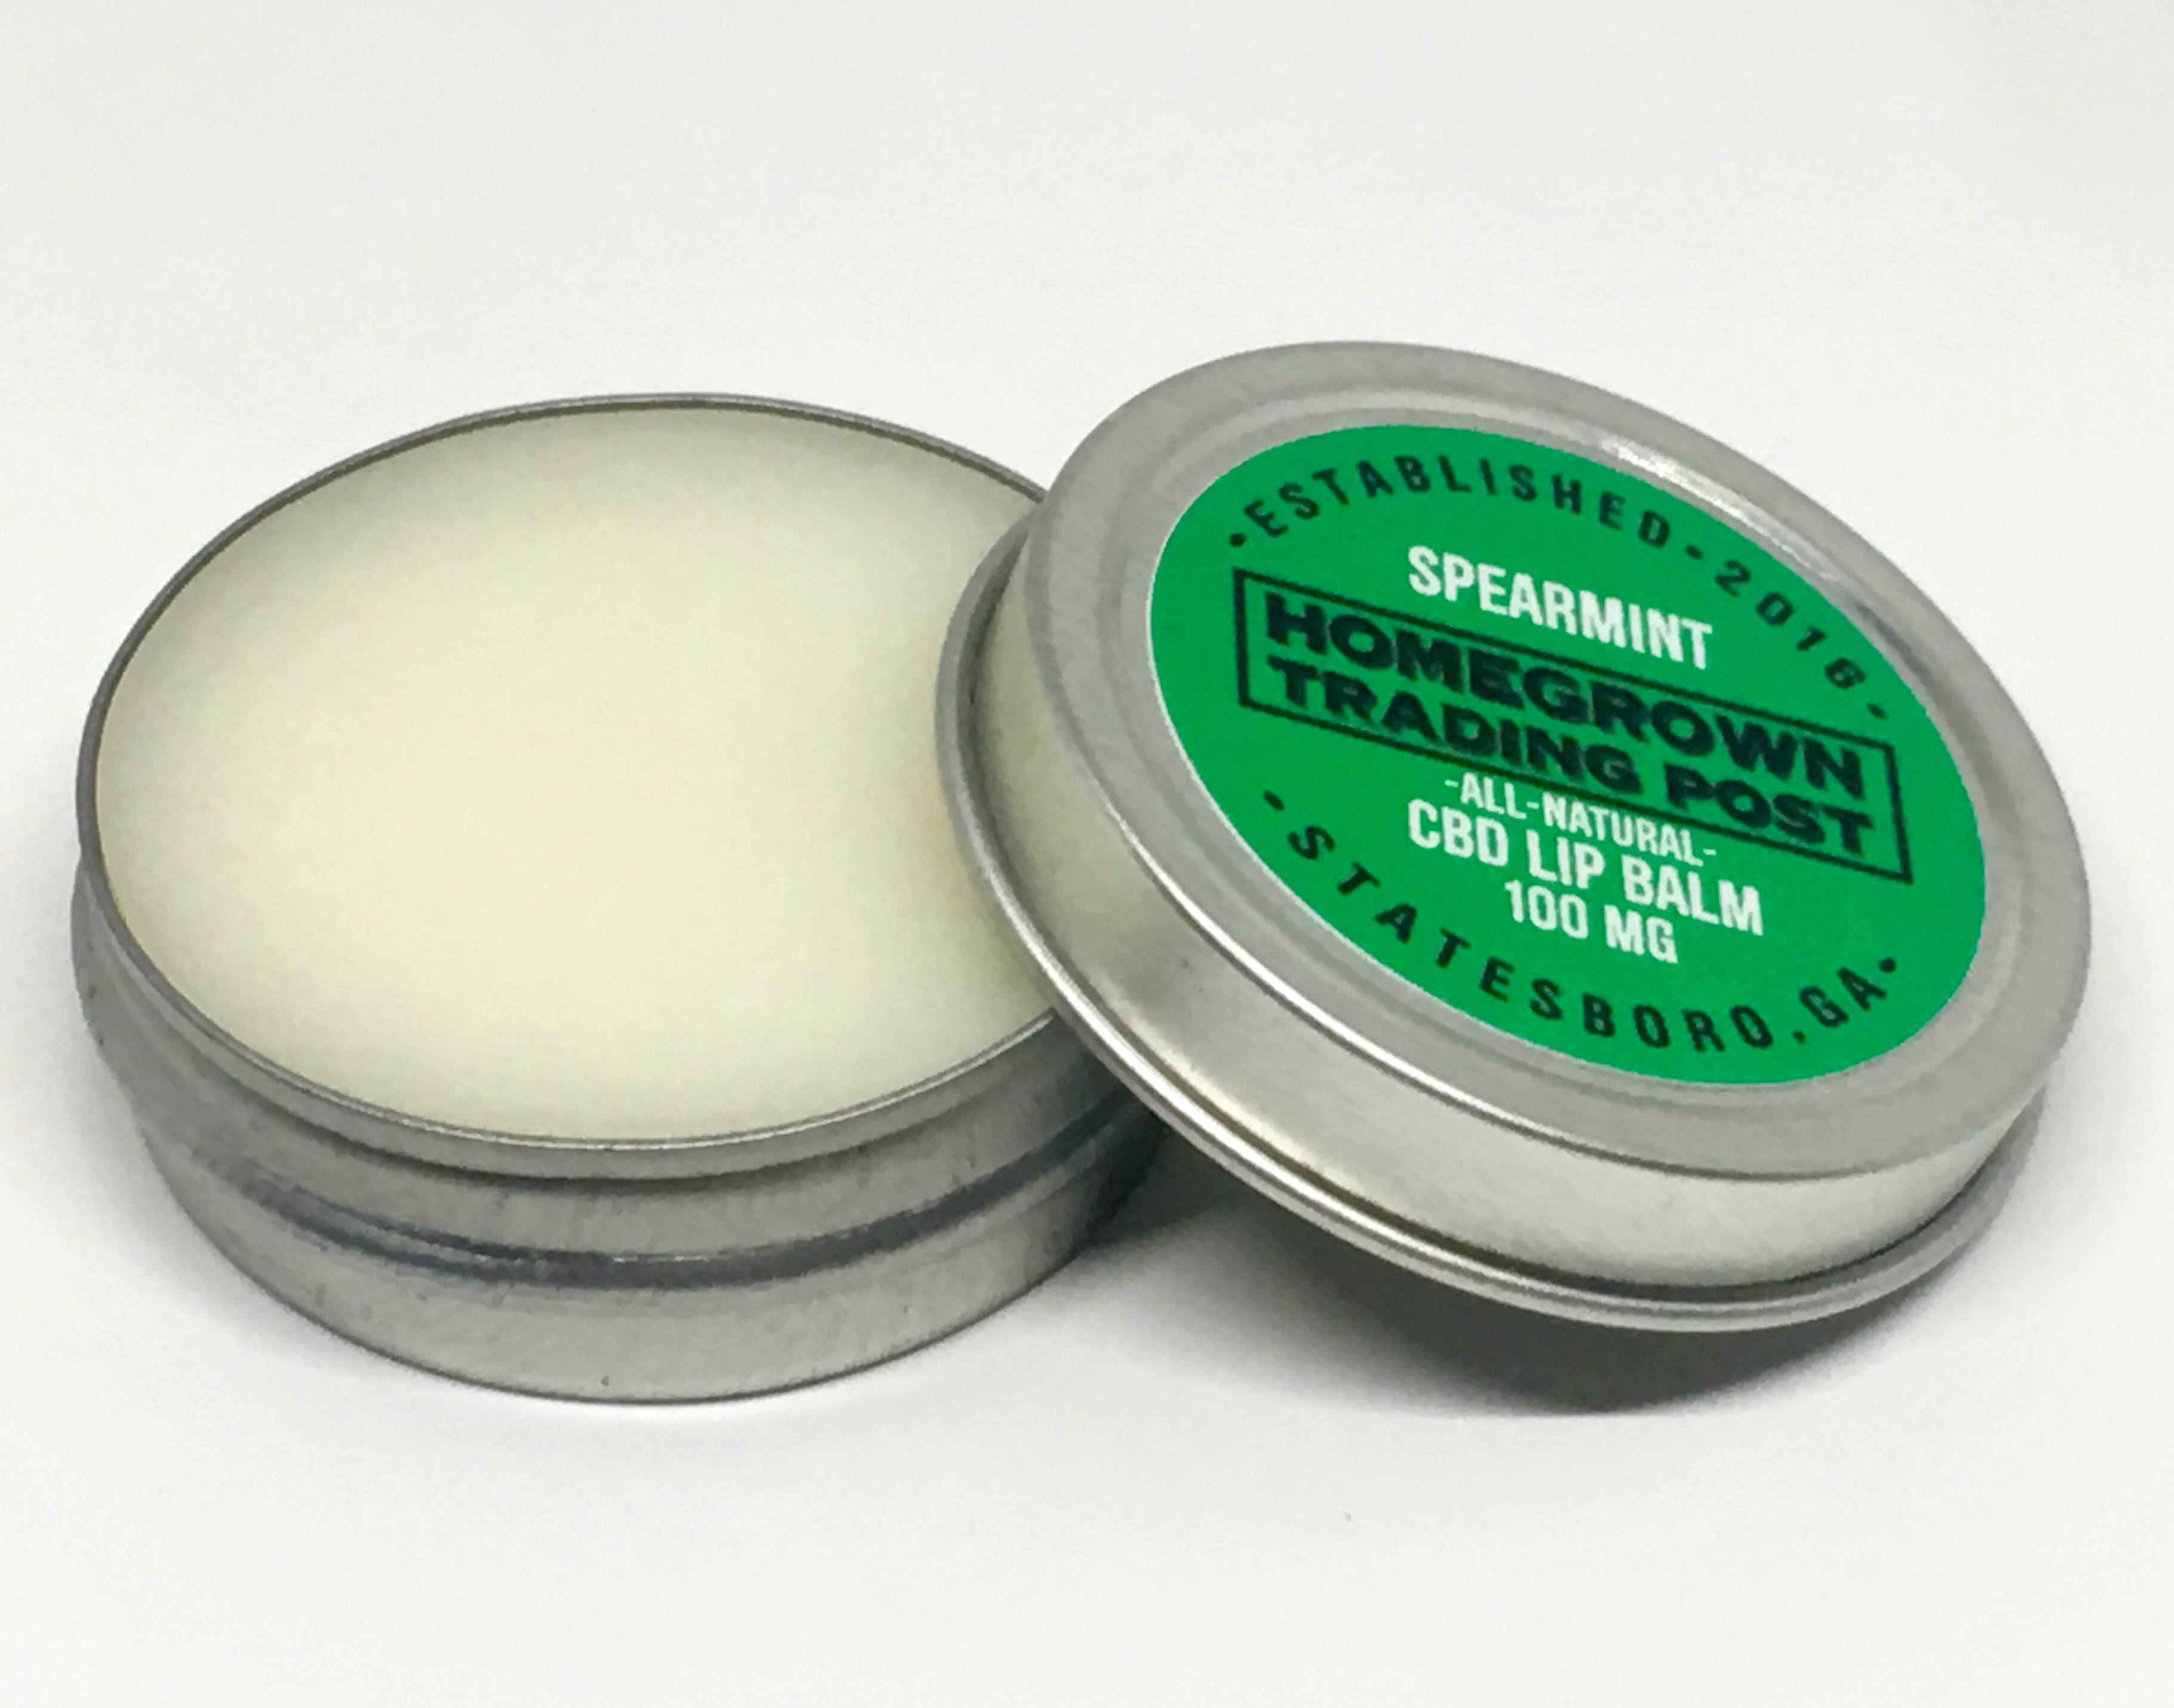 Spearmint CBD Lip Balm